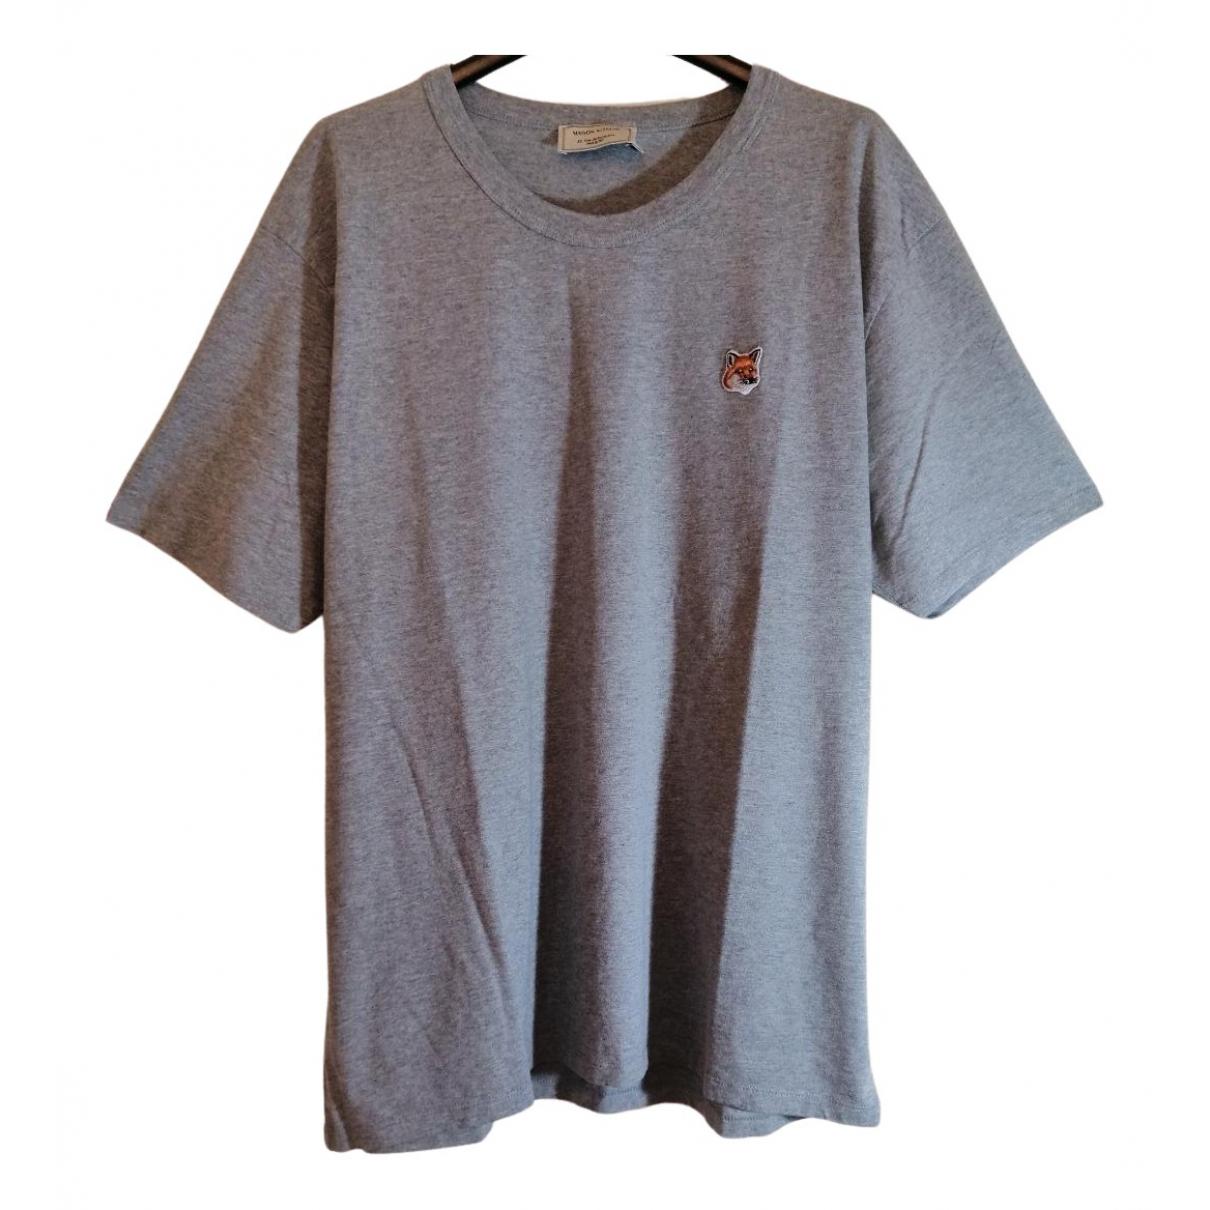 Maison Kitsune \N T-Shirts in  Grau Baumwolle